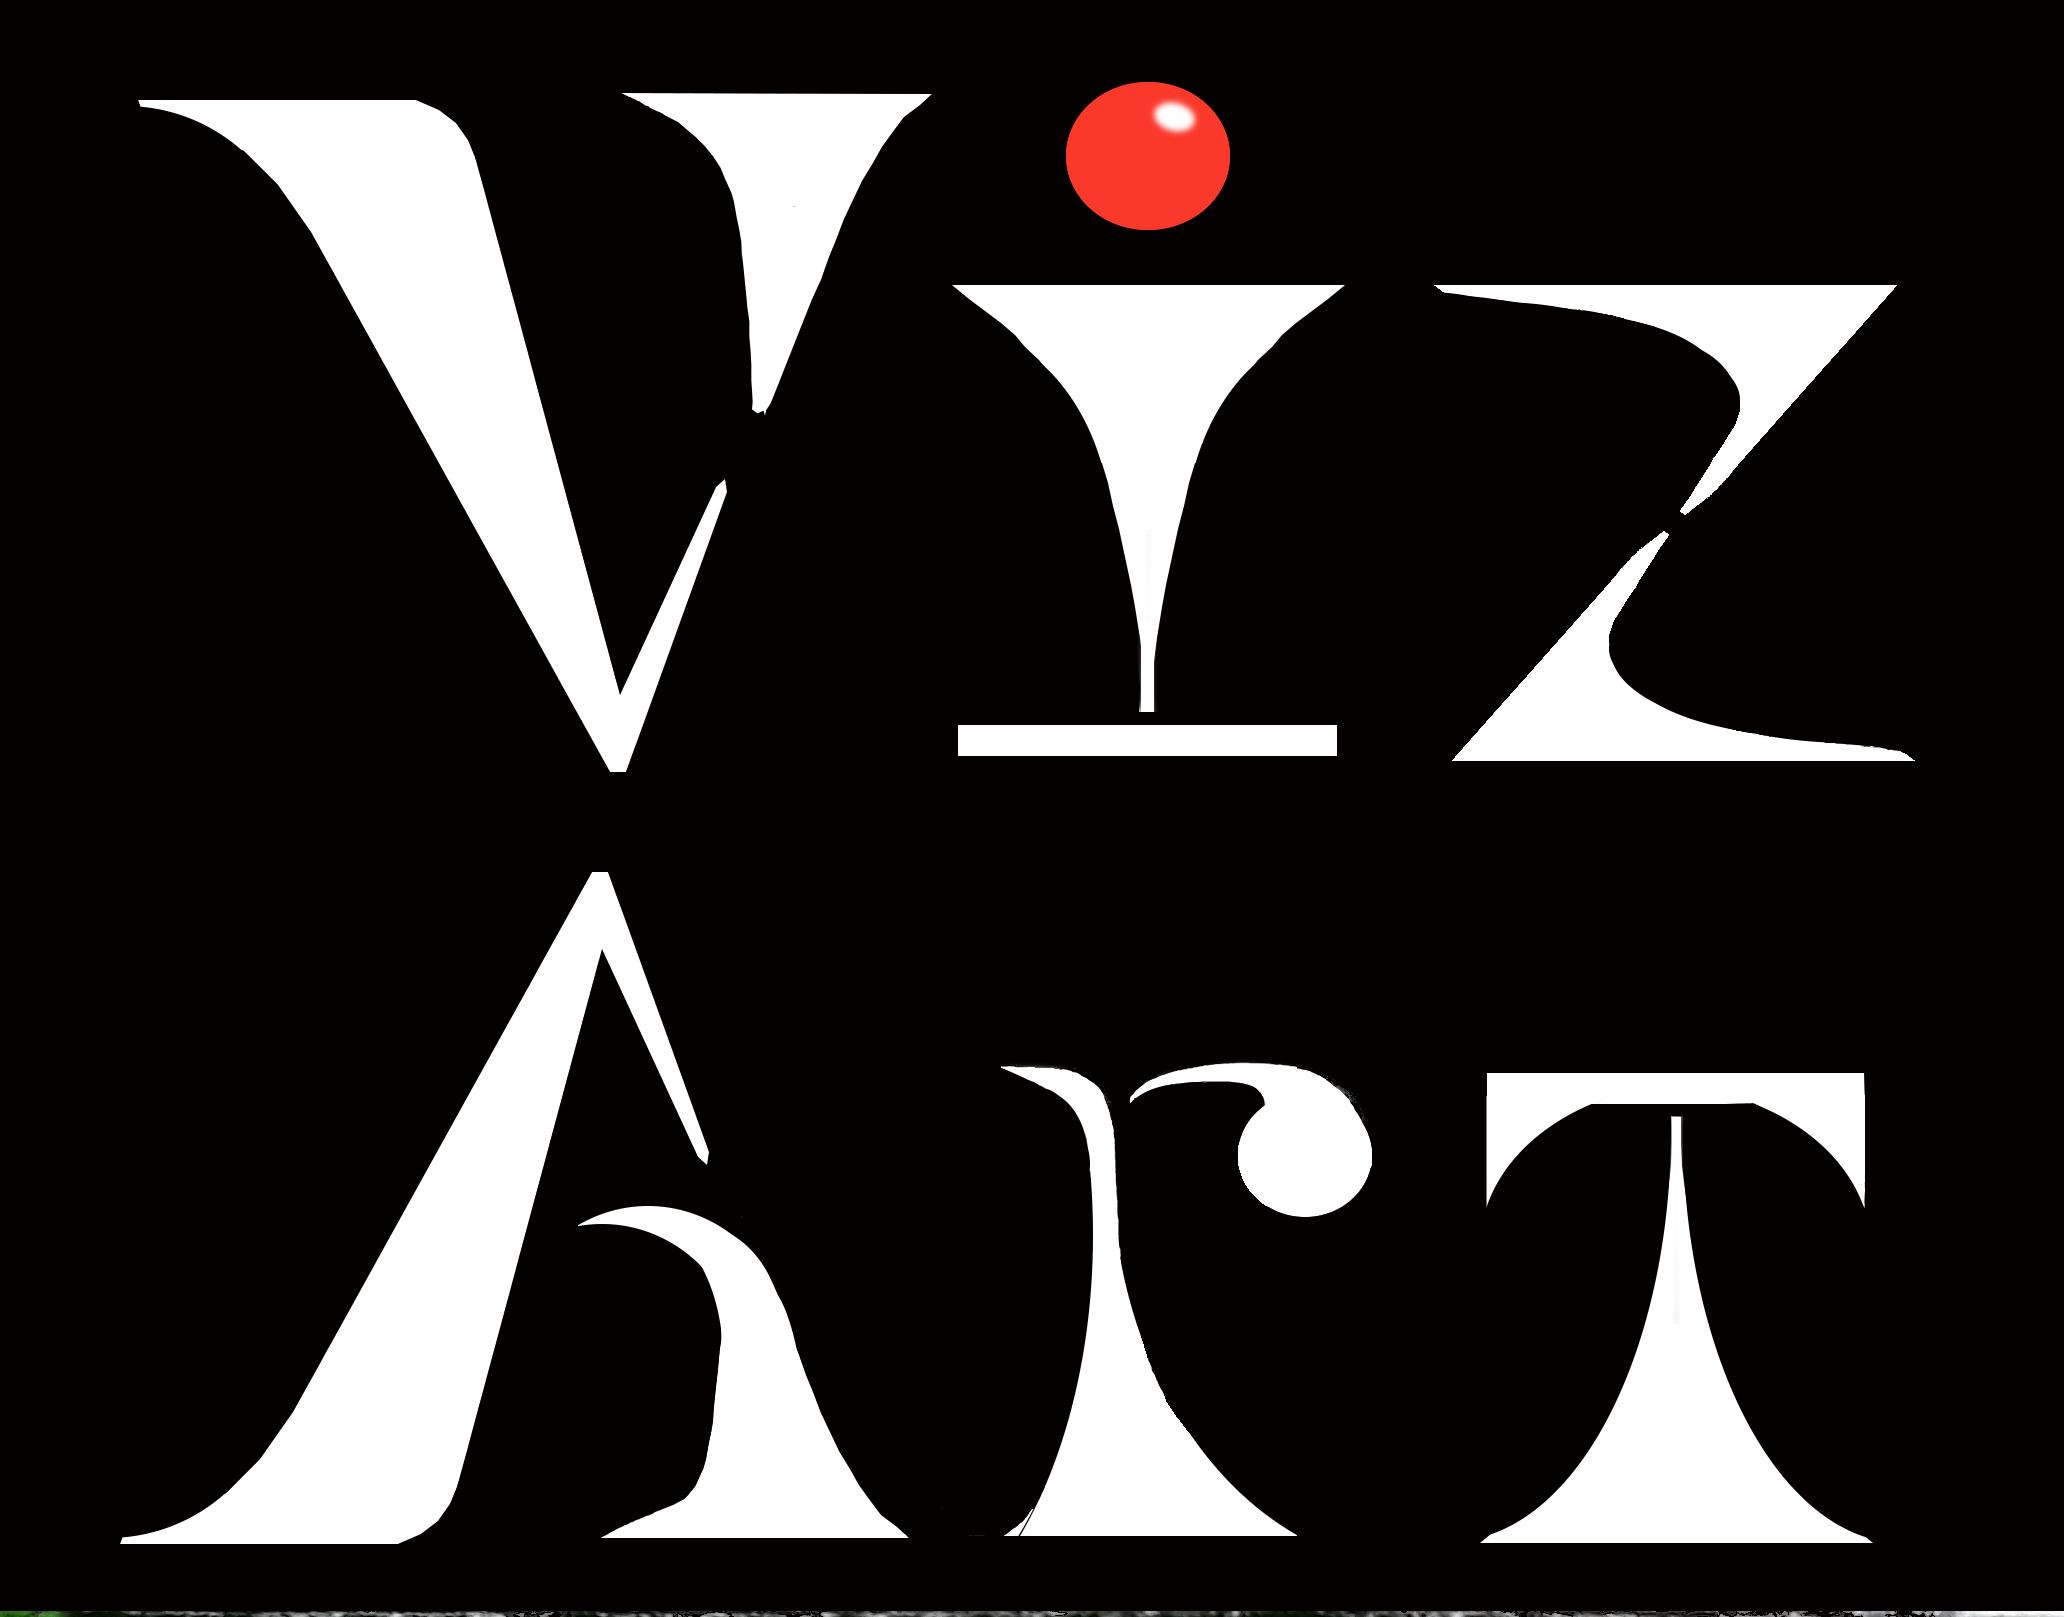 VIZ ART School